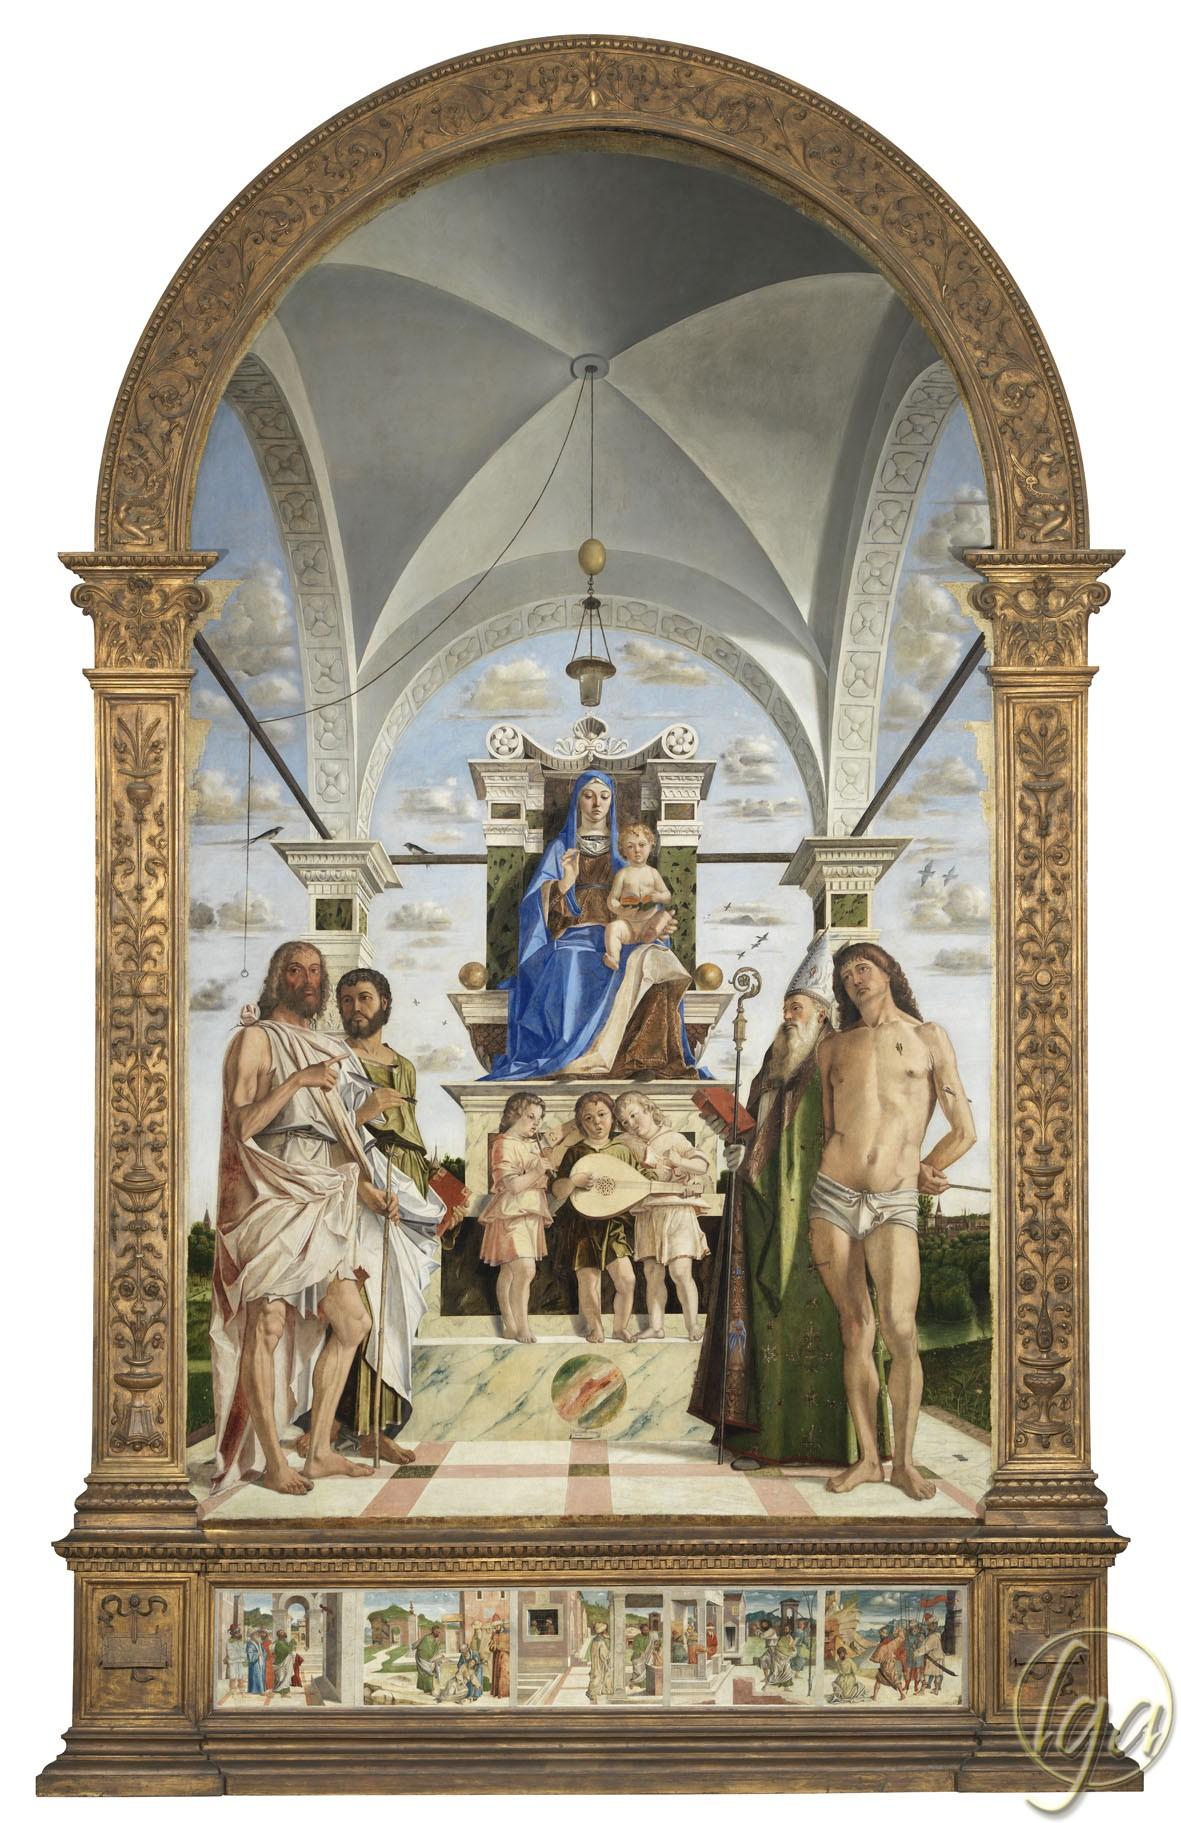 1485 Bartolomeo Montagna Pala de San Bartolomeo pinacoteca civica di Vicenza